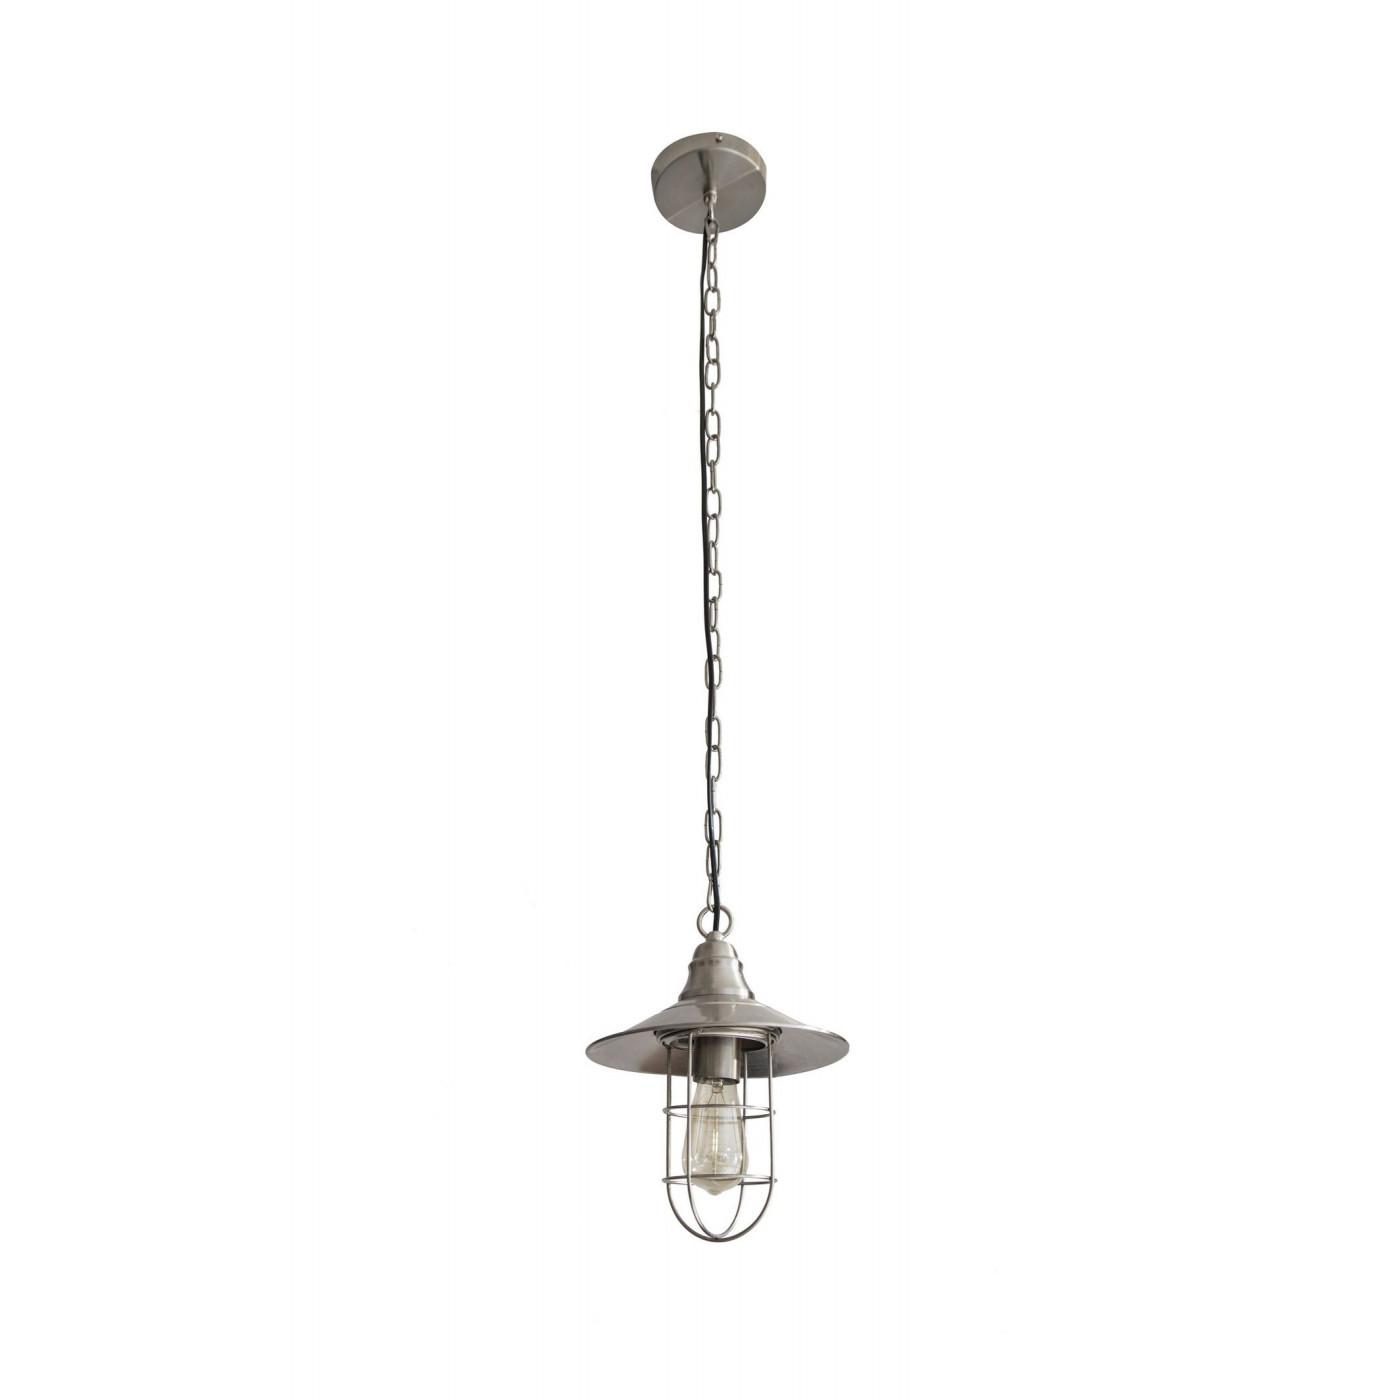 Lampa loftowa metalowa w stylu retro